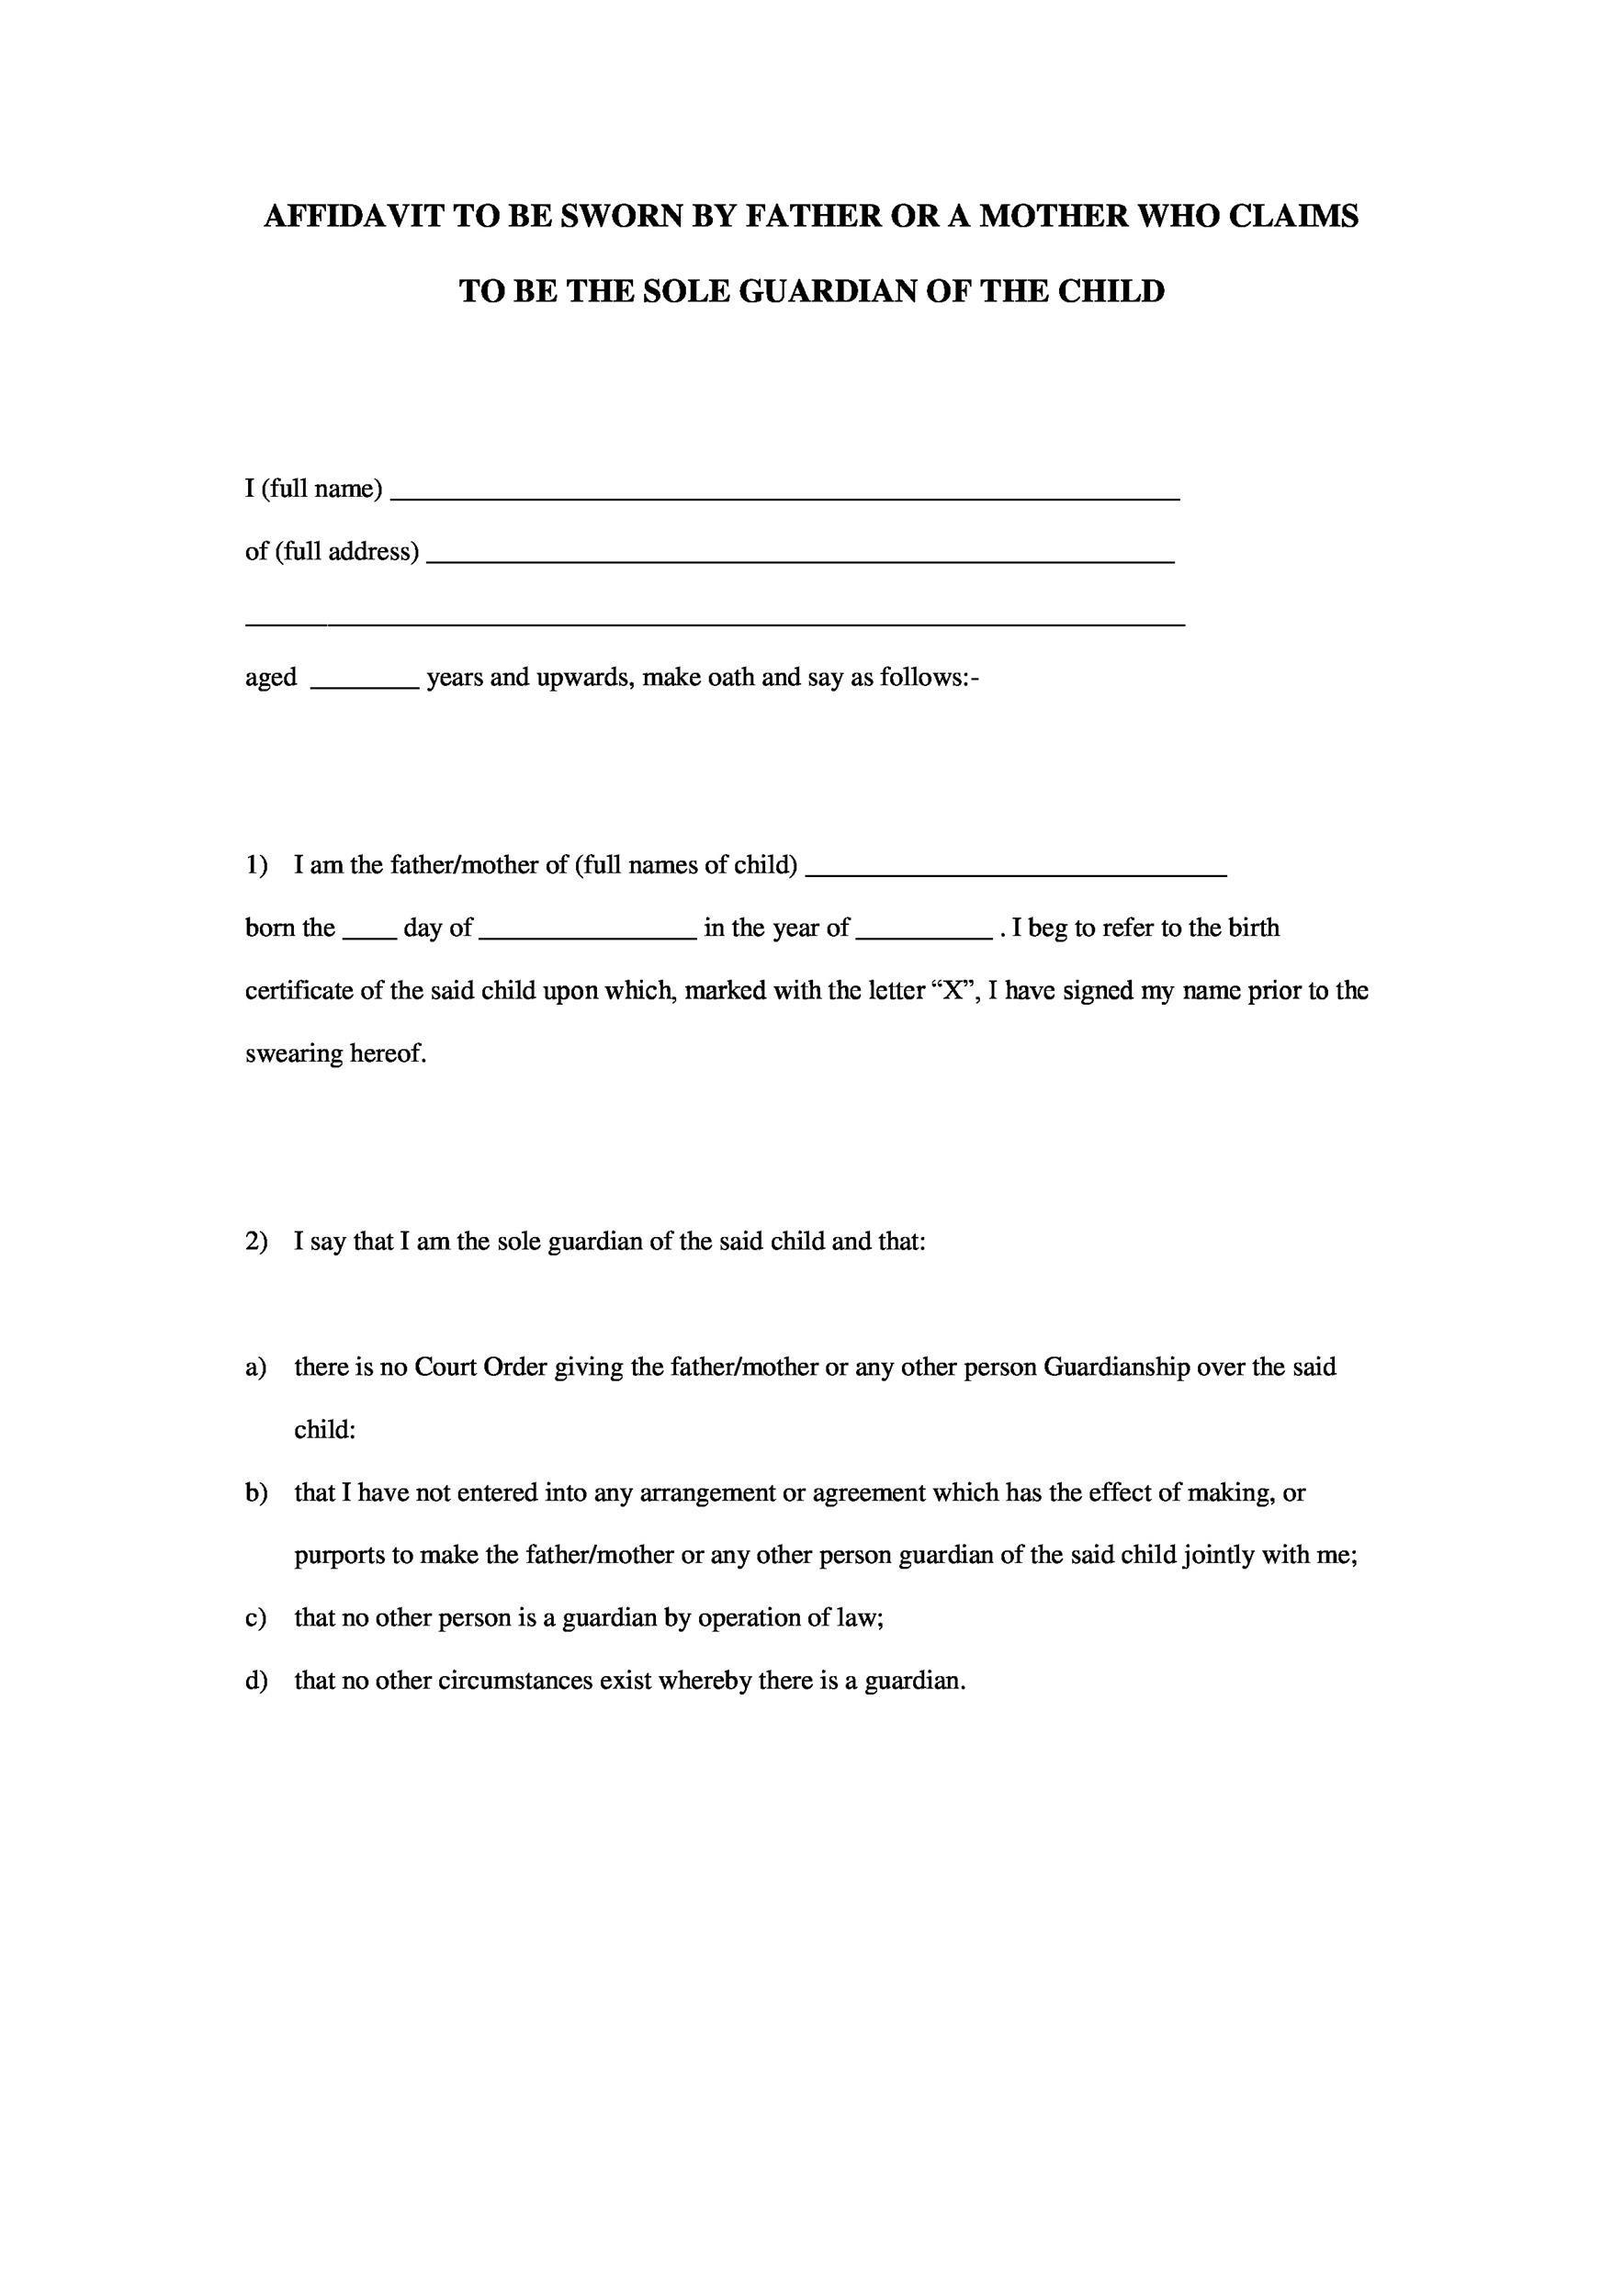 Free affidavit form 33